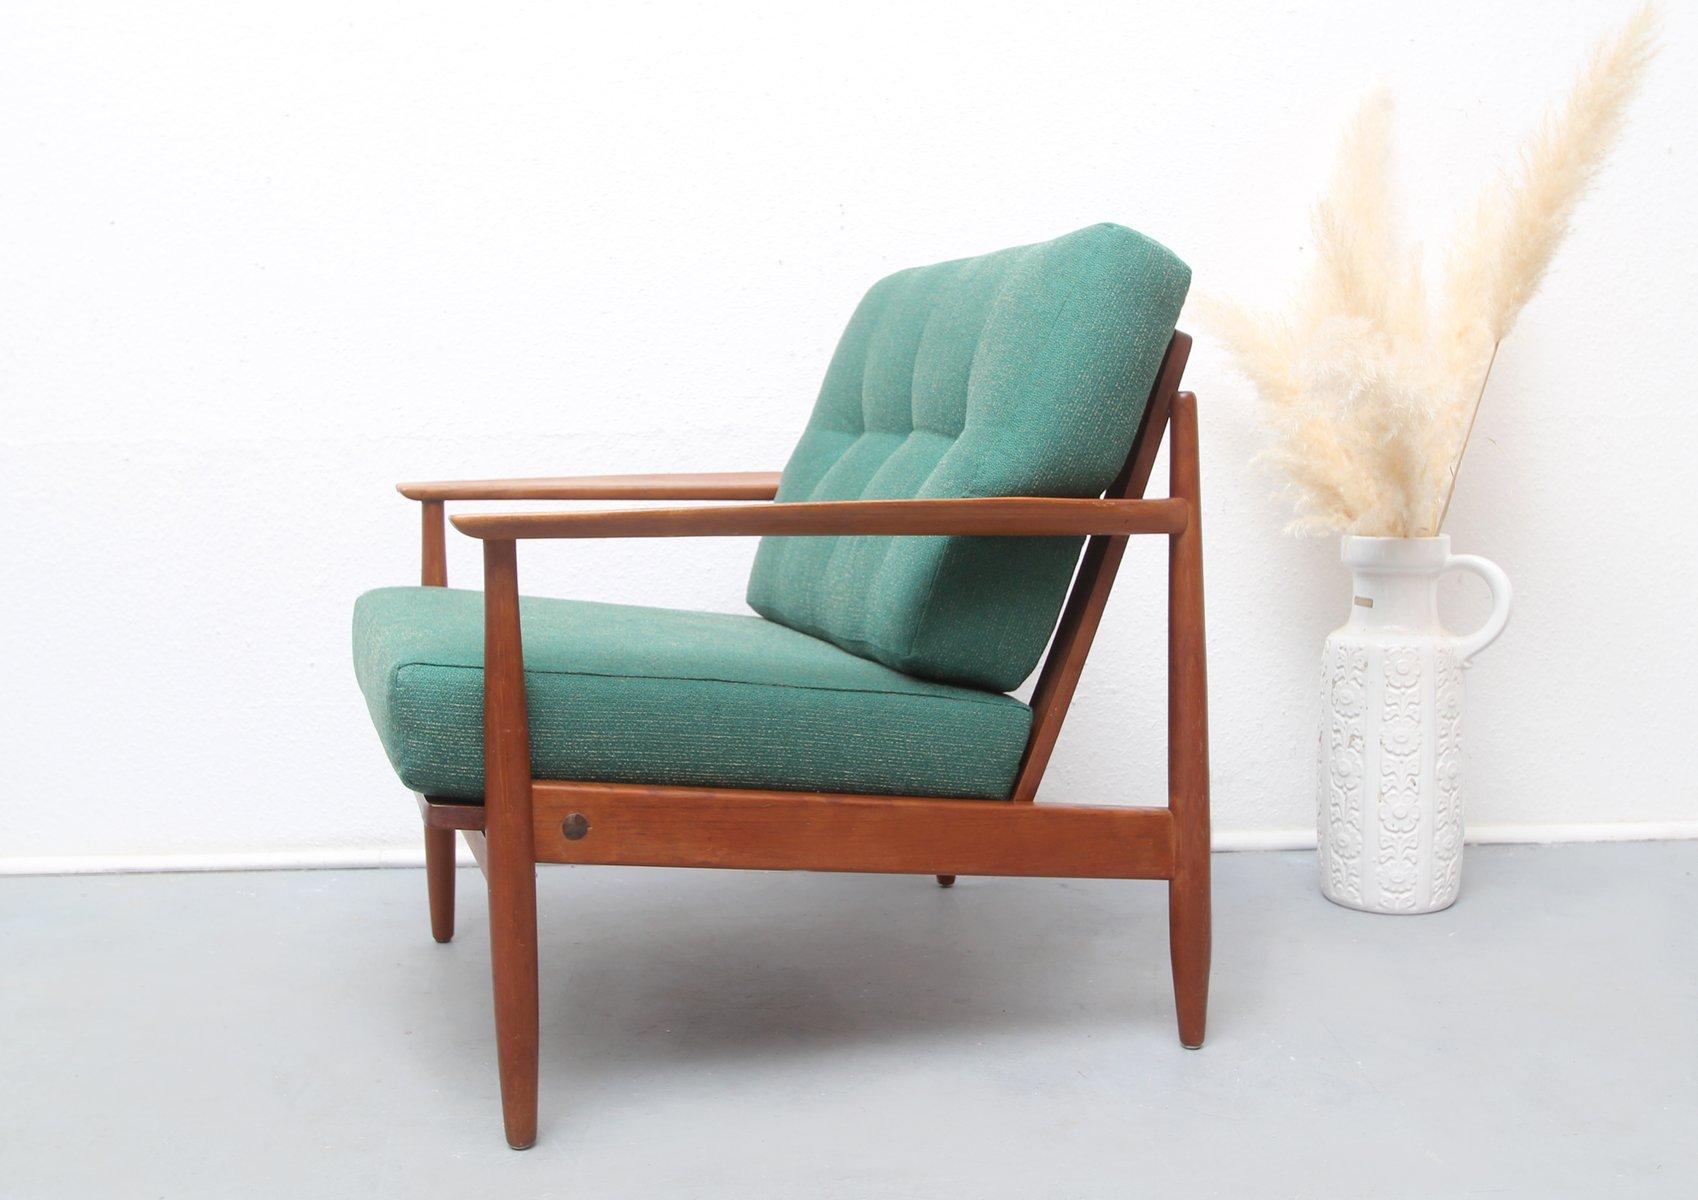 Mid century teak sessel aus deutschland 1960er bei pamono for Sessel scandi